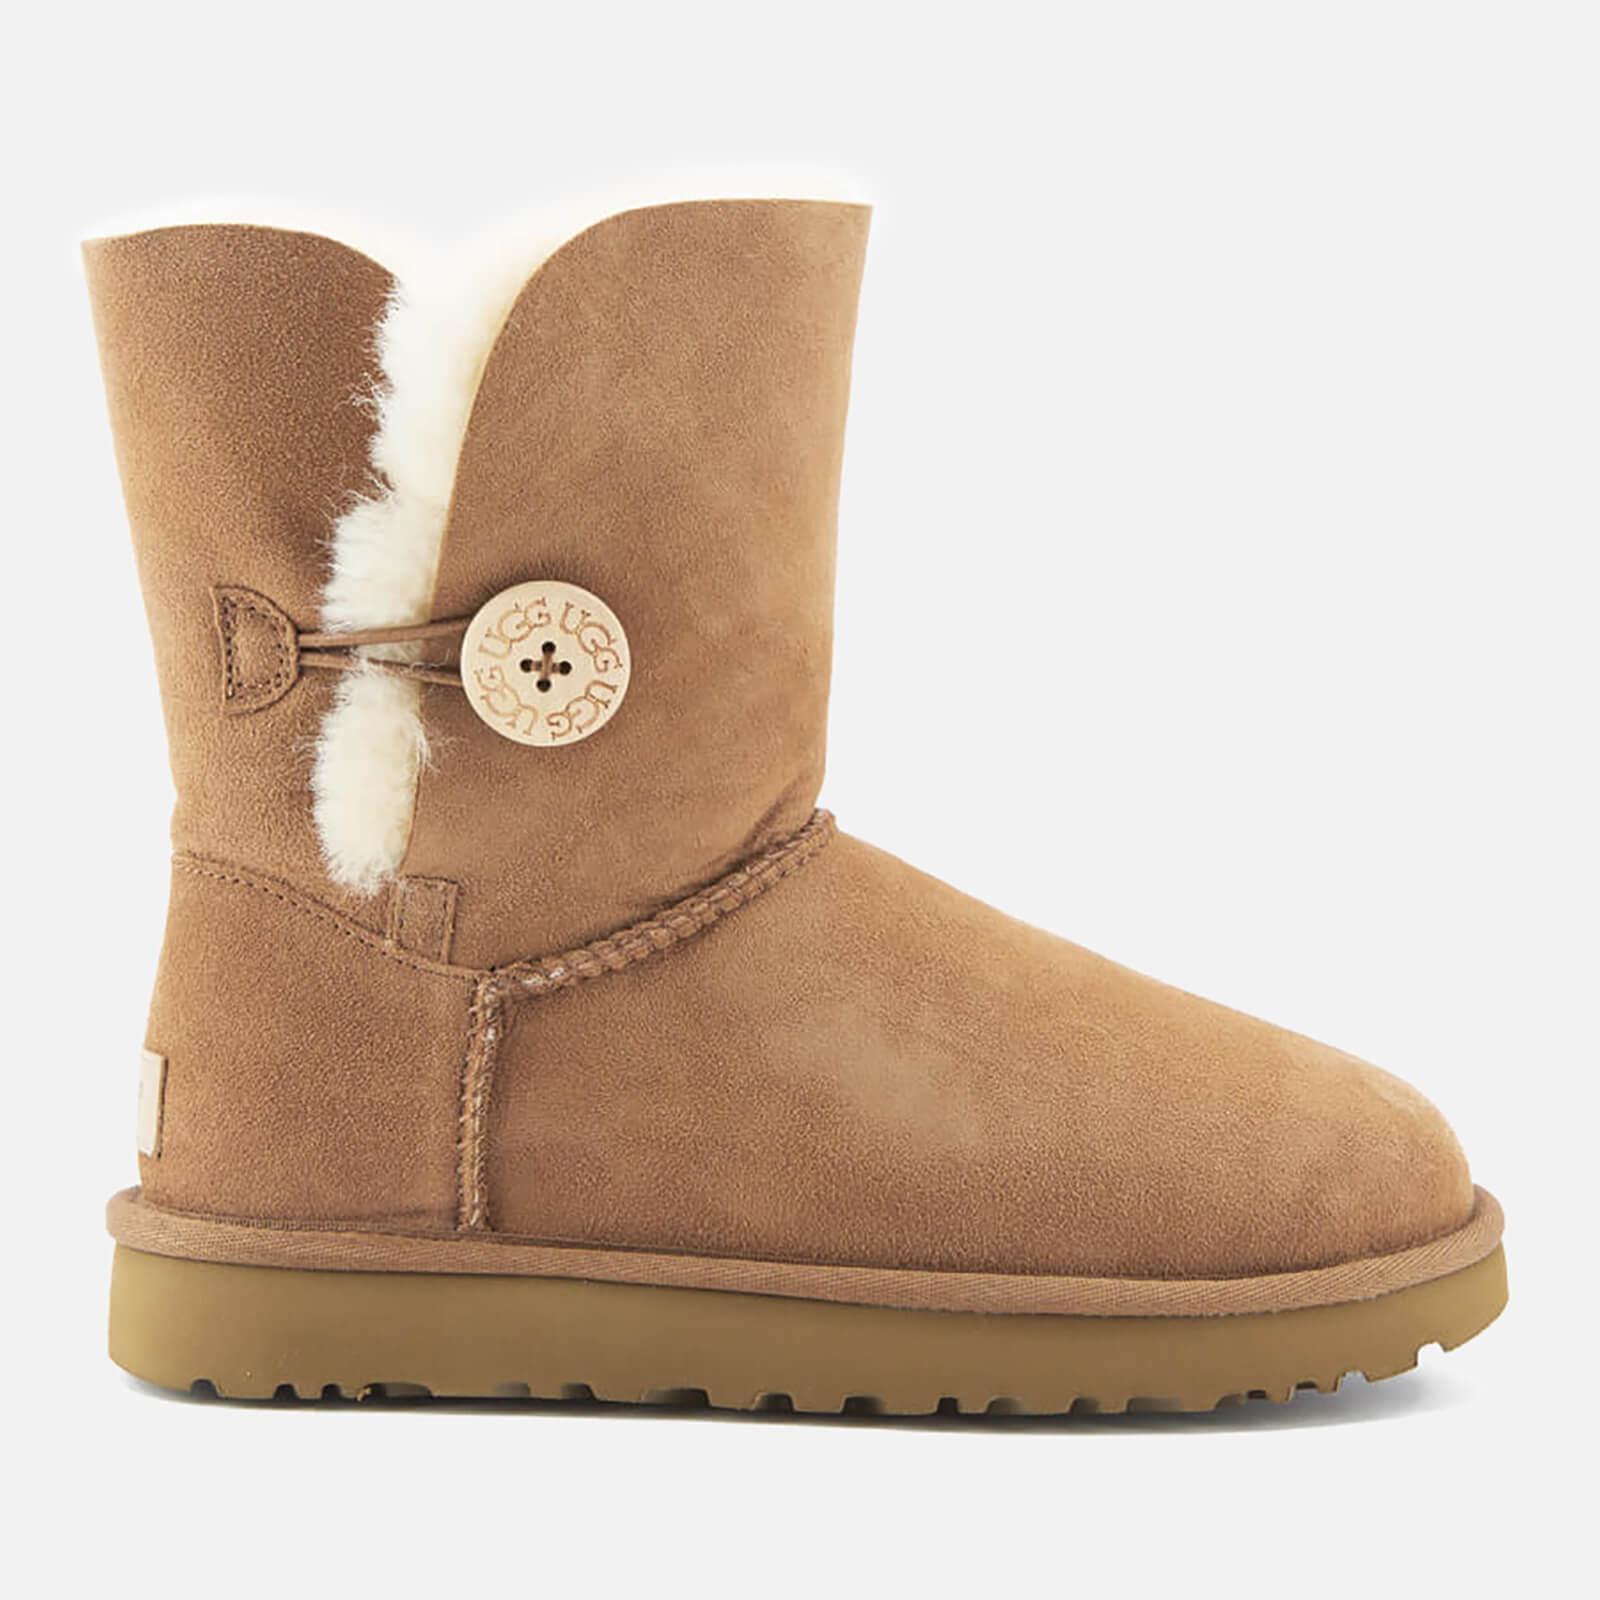 Ugg Women's Bailey Button Ii Sheepskin Boots - Chestnut - Uk 3